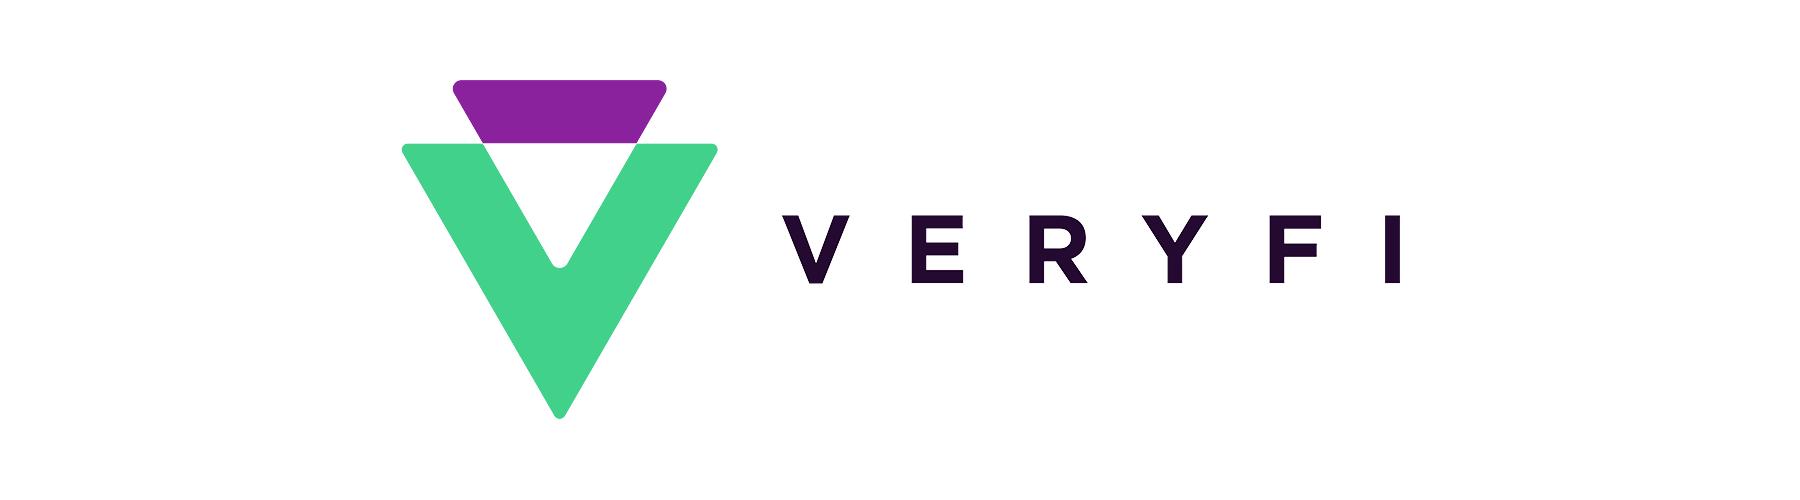 Veryfi.com